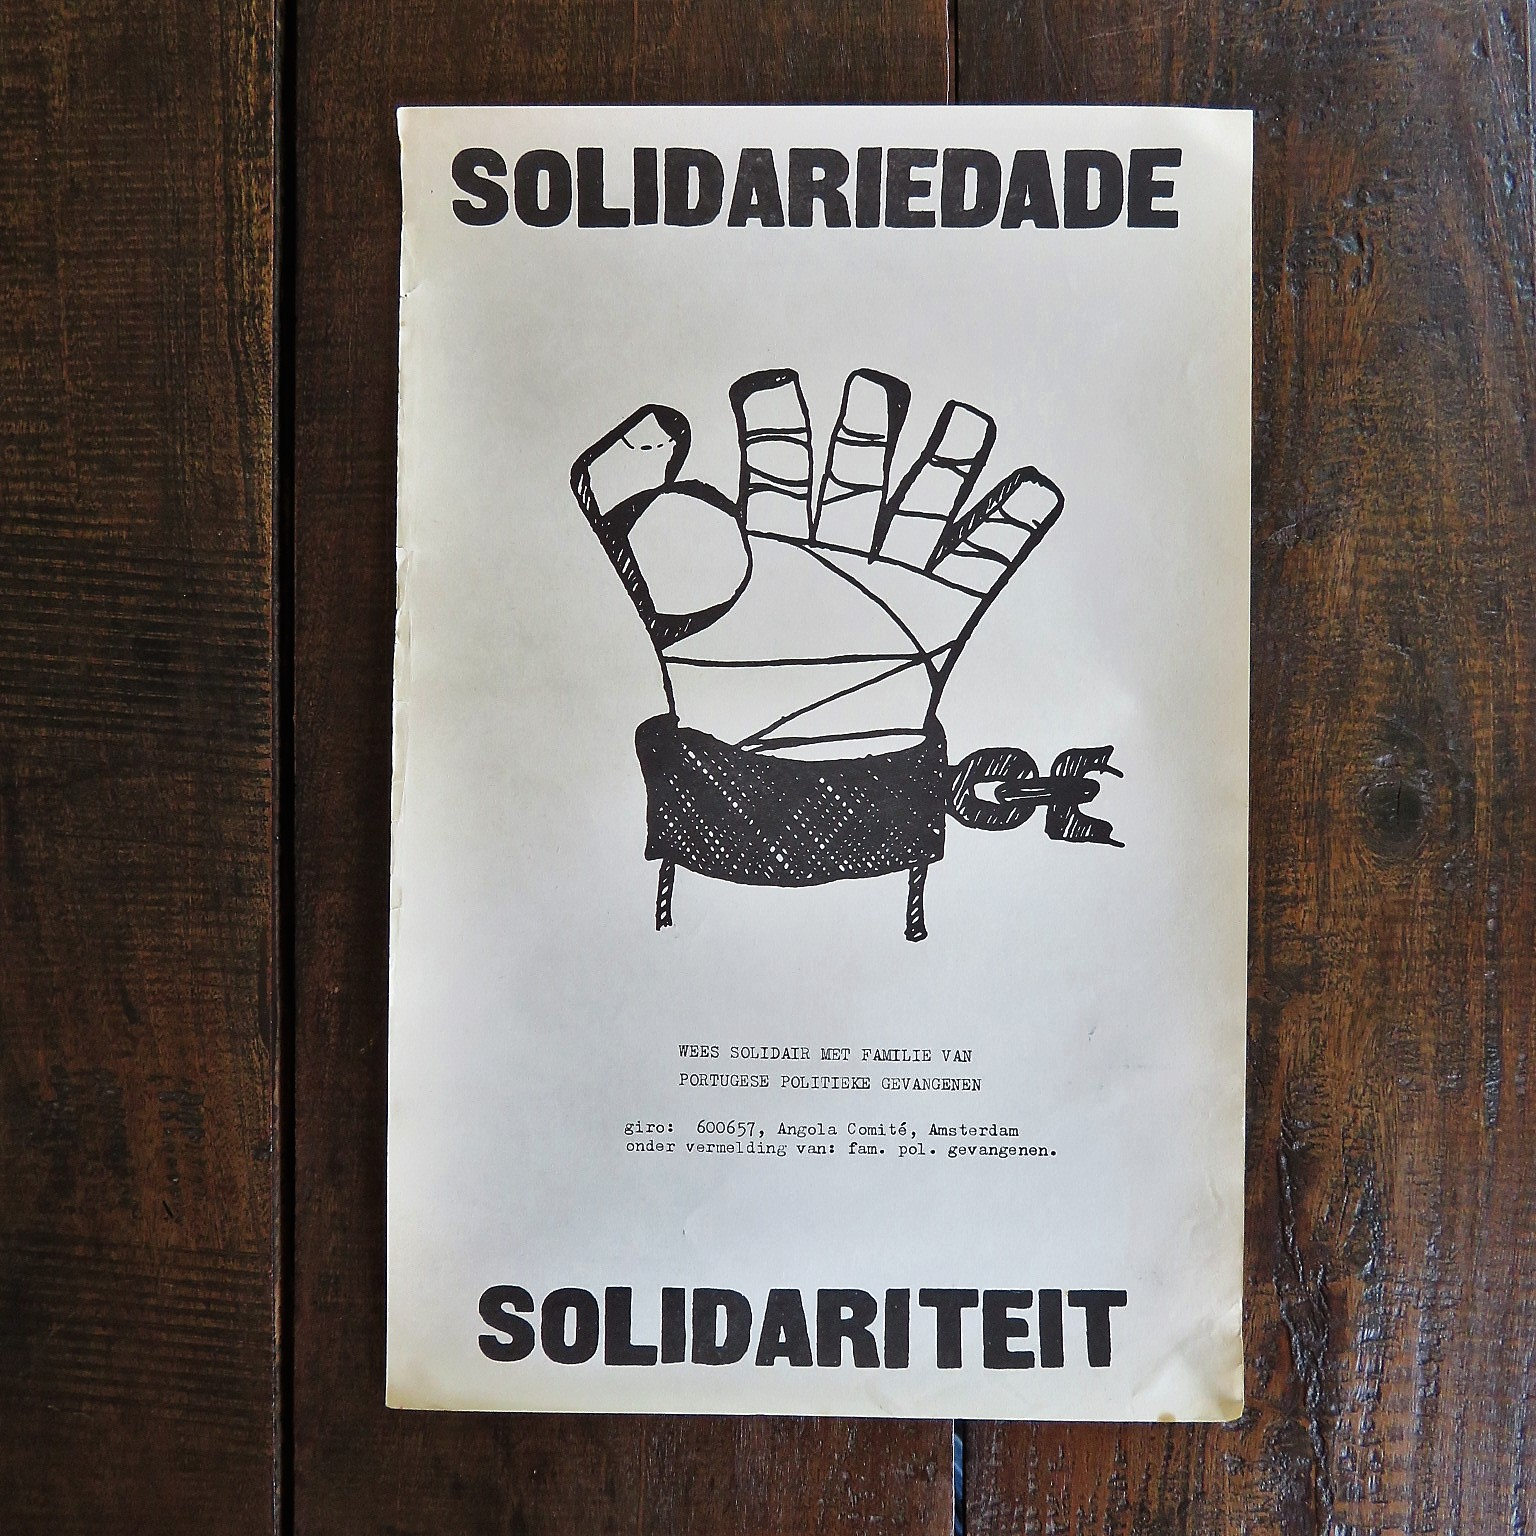 poster-solidariedade-nederland-1